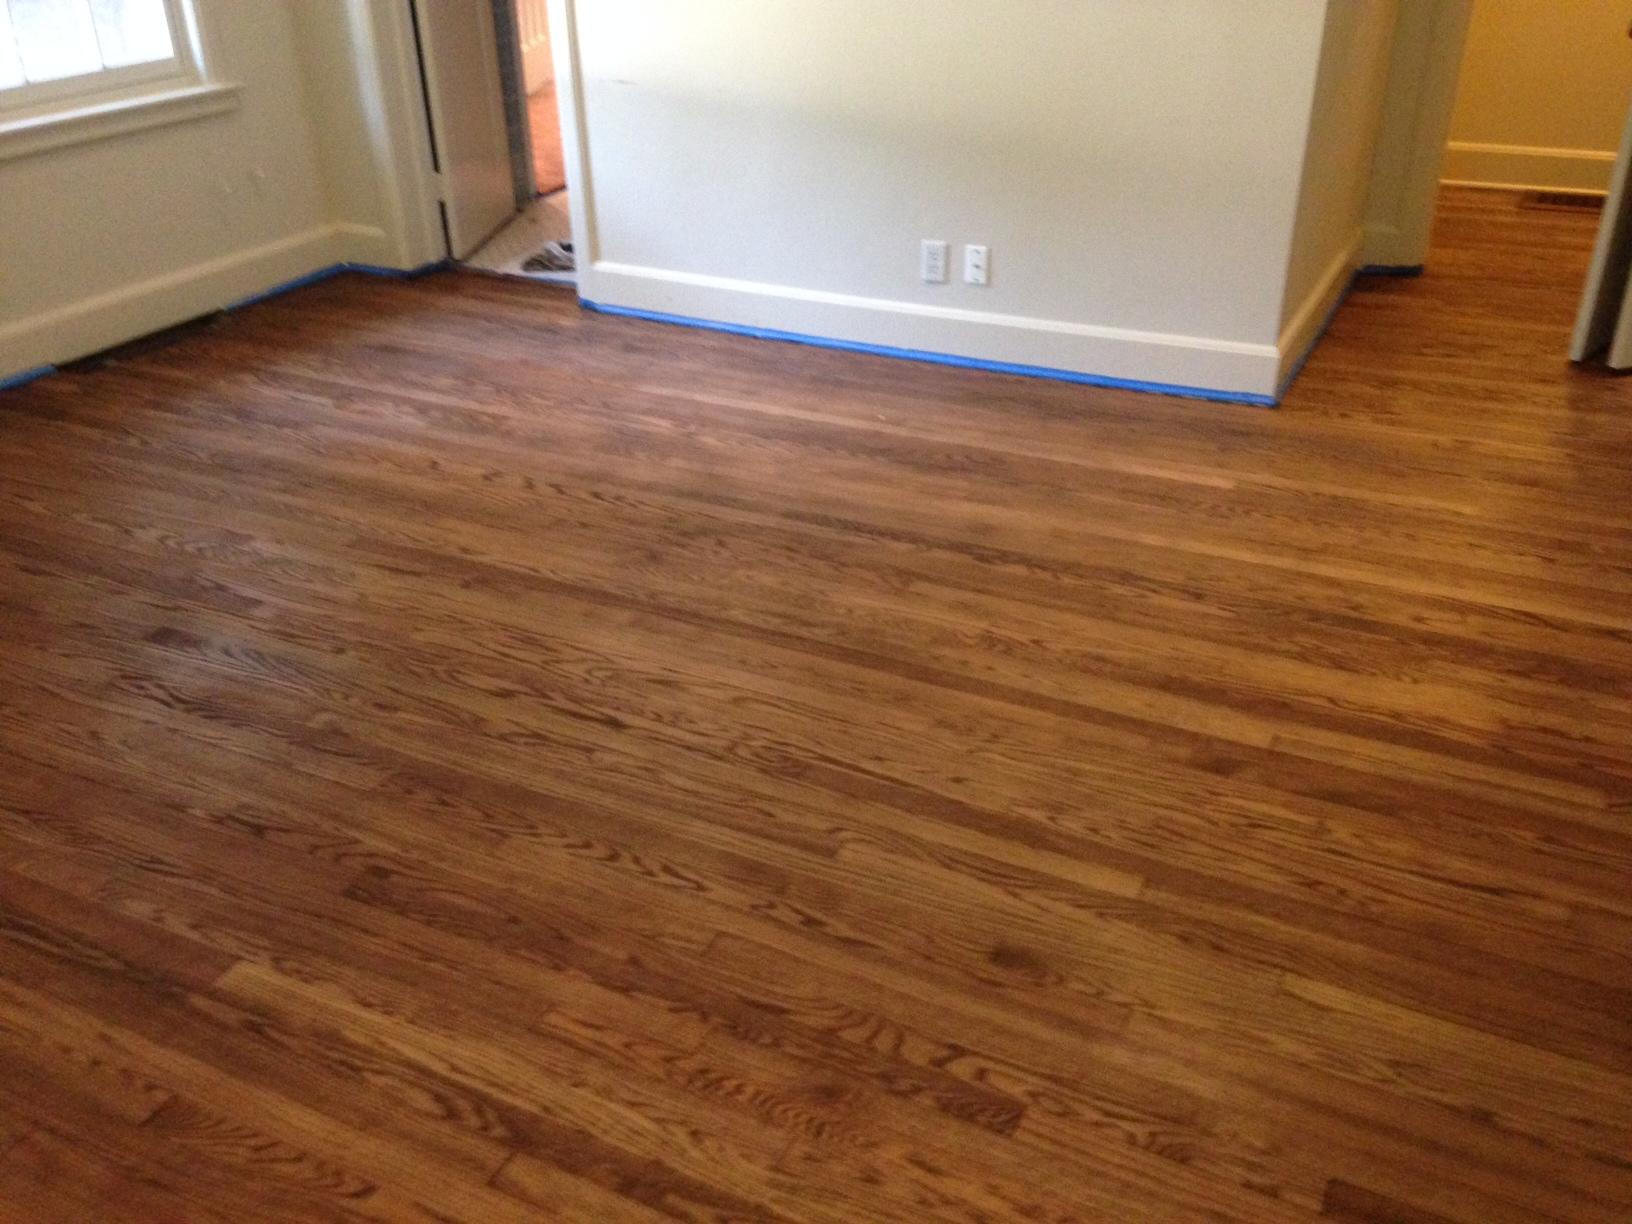 Parquet wood floor refinishing archives dan 39 s floor store for Hardwood flooring nearby